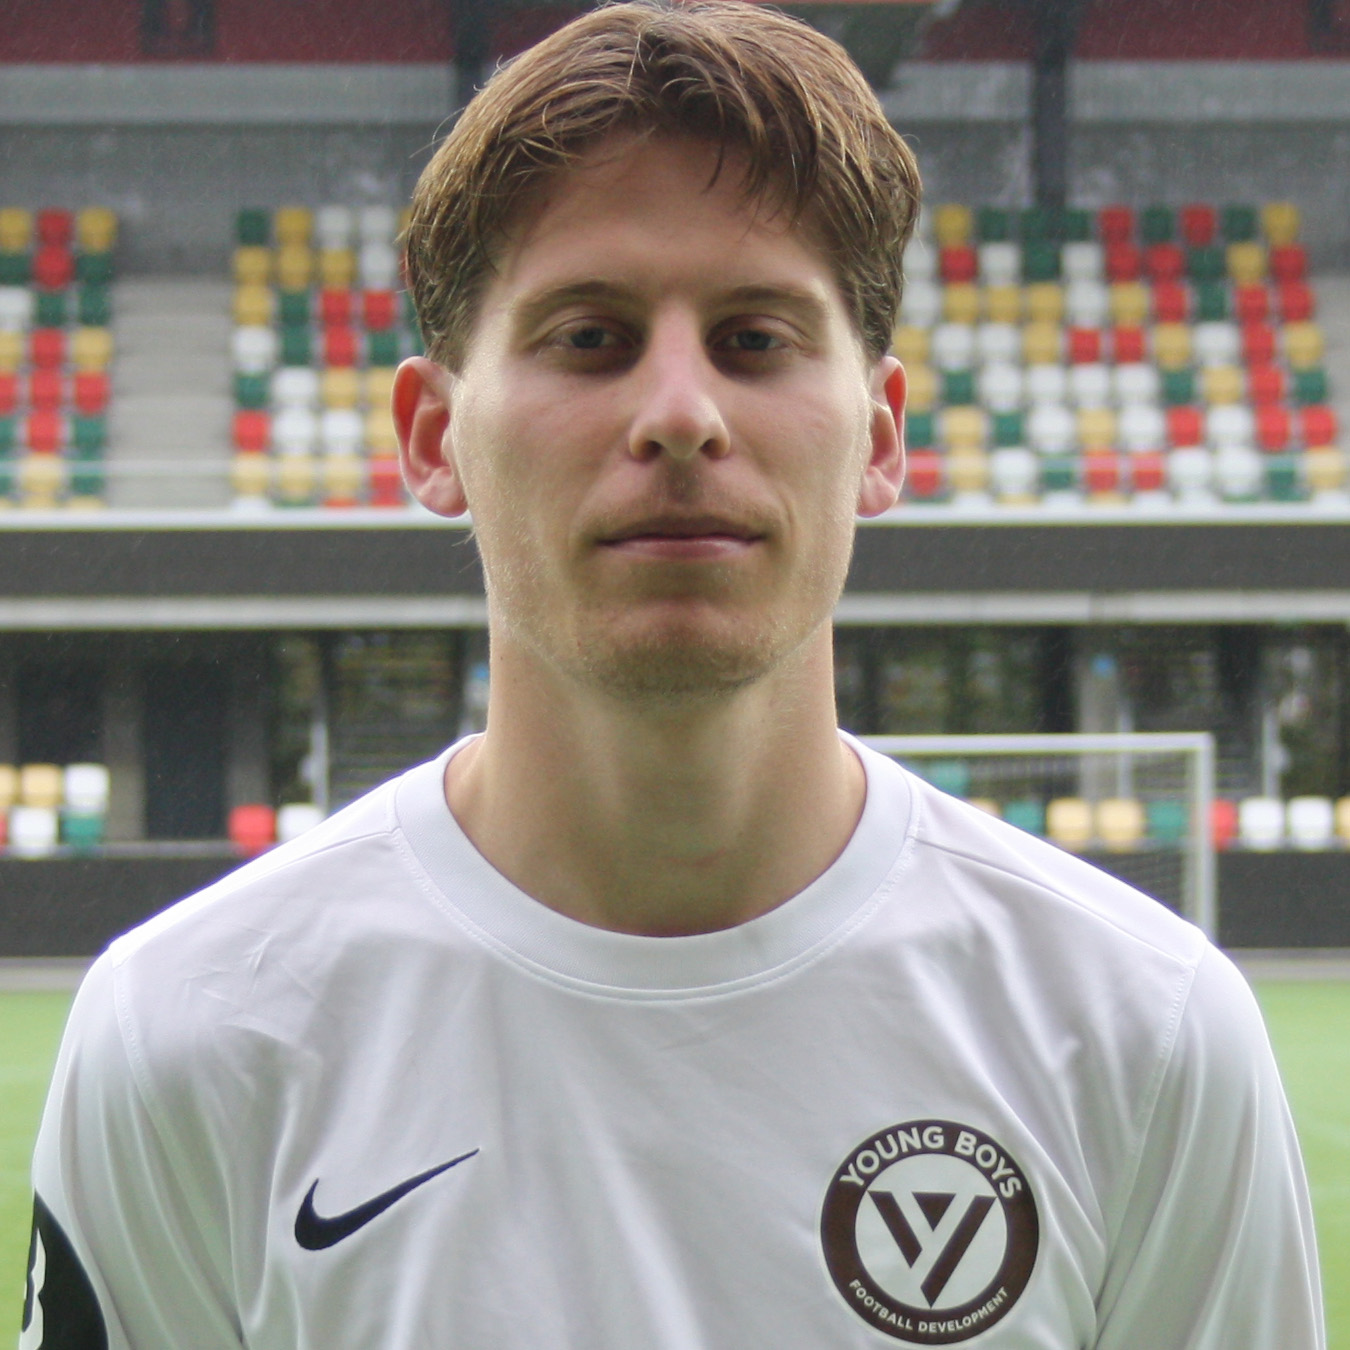 Thomas Bejder